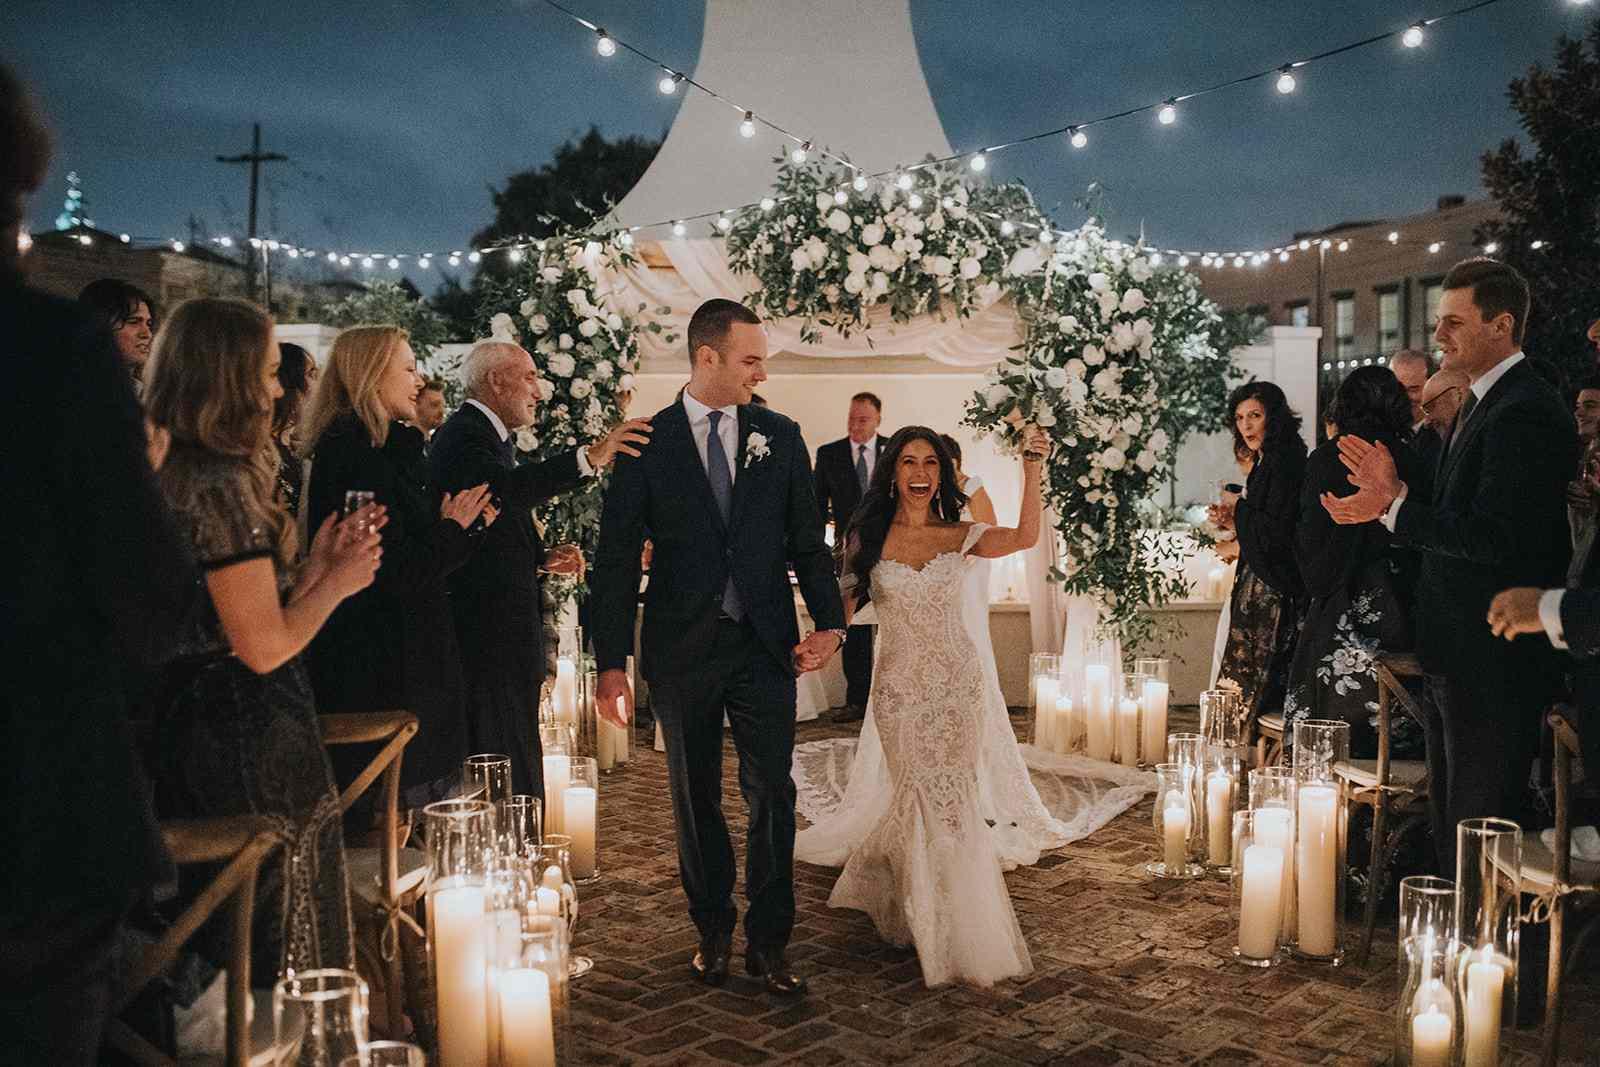 newlyweds exit ceremony